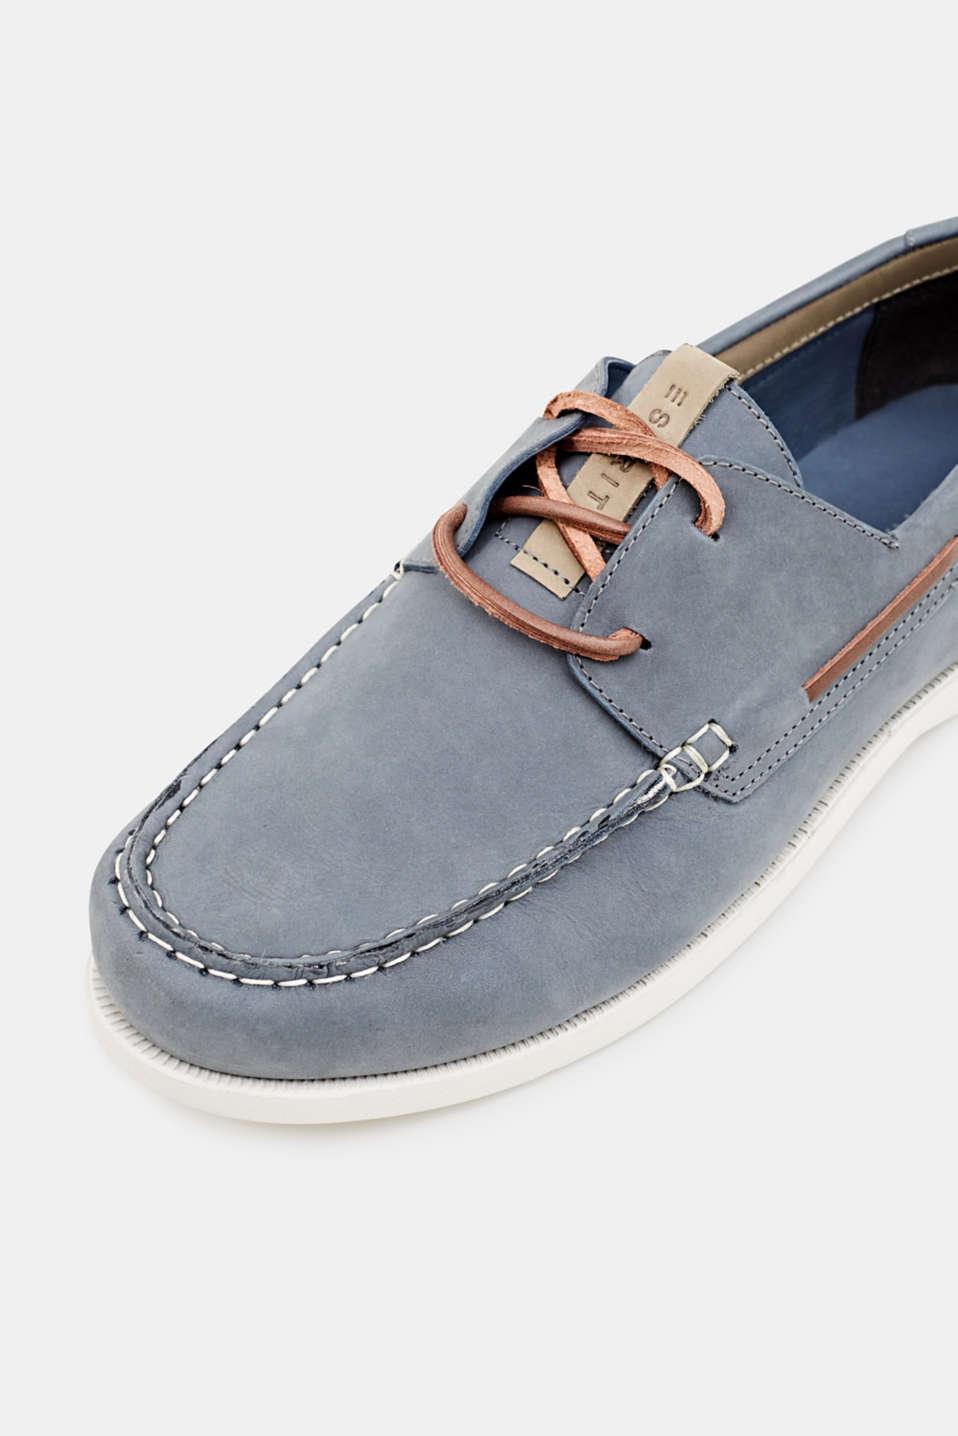 Leather boat shoes, LIGHT BLUE, detail image number 3